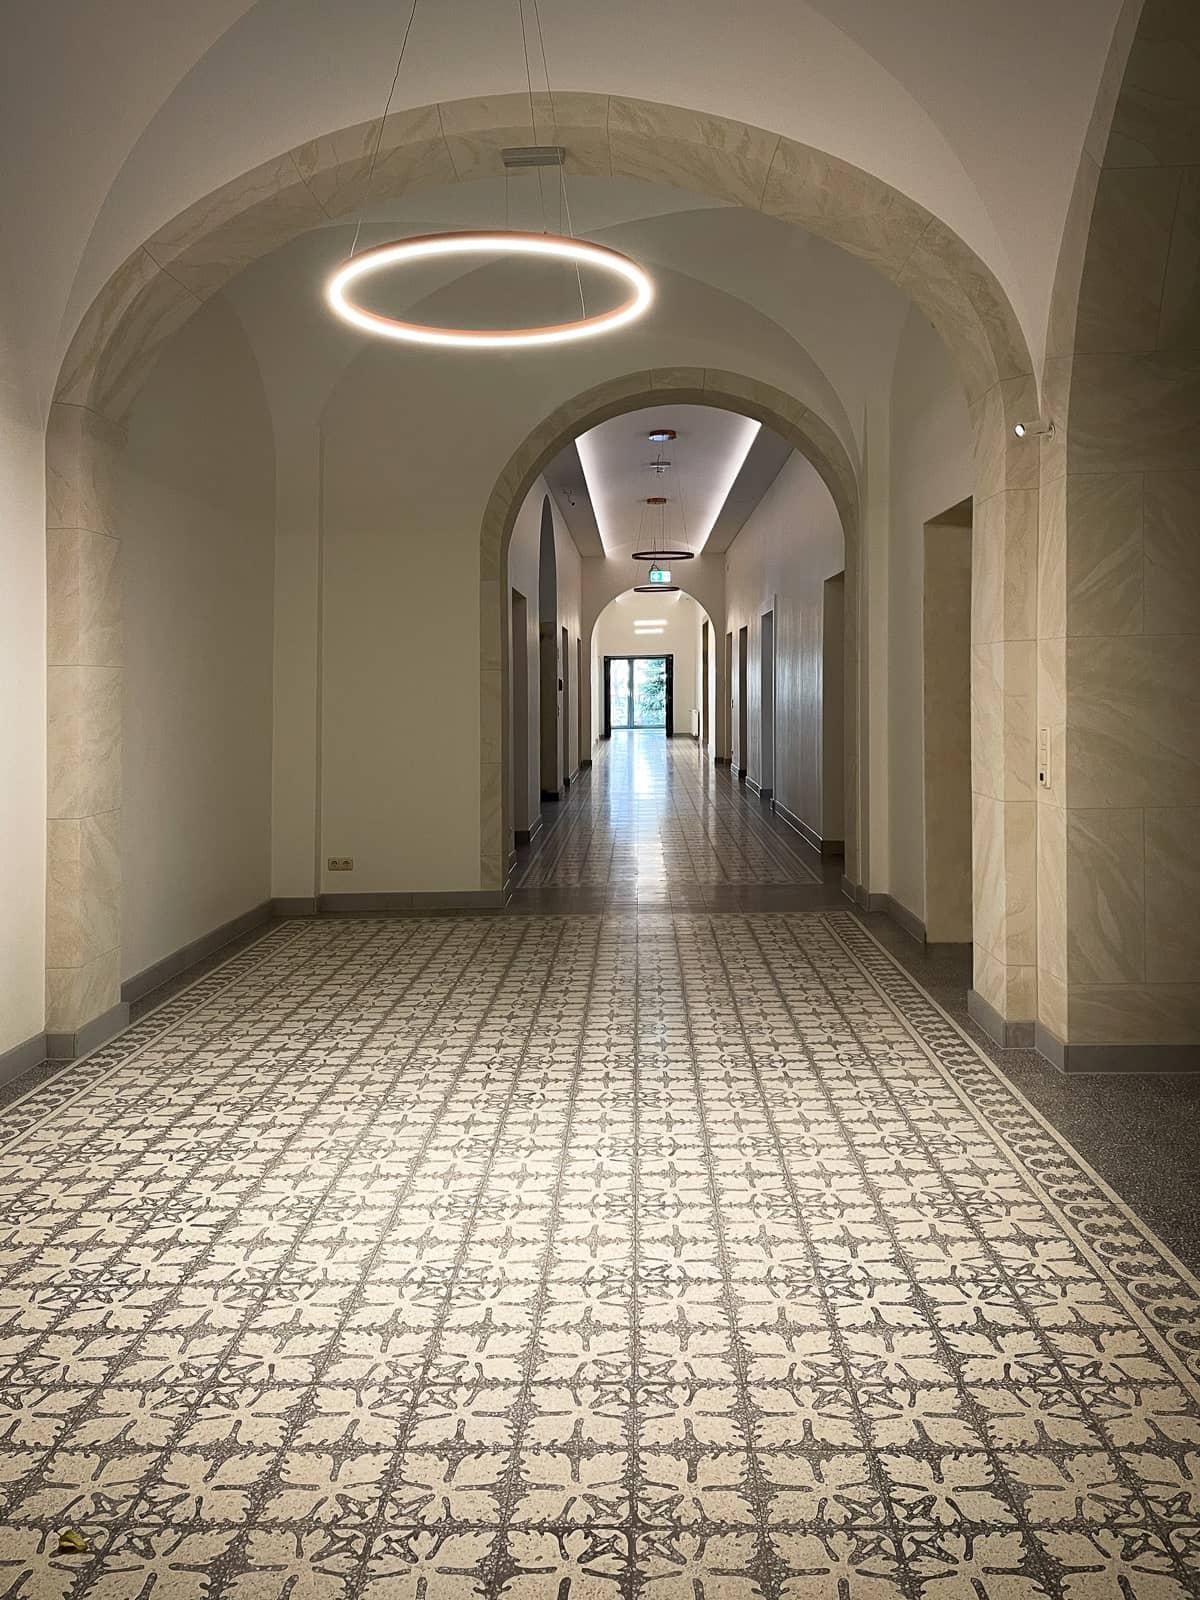 zementfliesen-terrazzofliesen-kreidefarbe-terrazzo-911254-fugenlos-viaplatten-kloster-flur | 911254